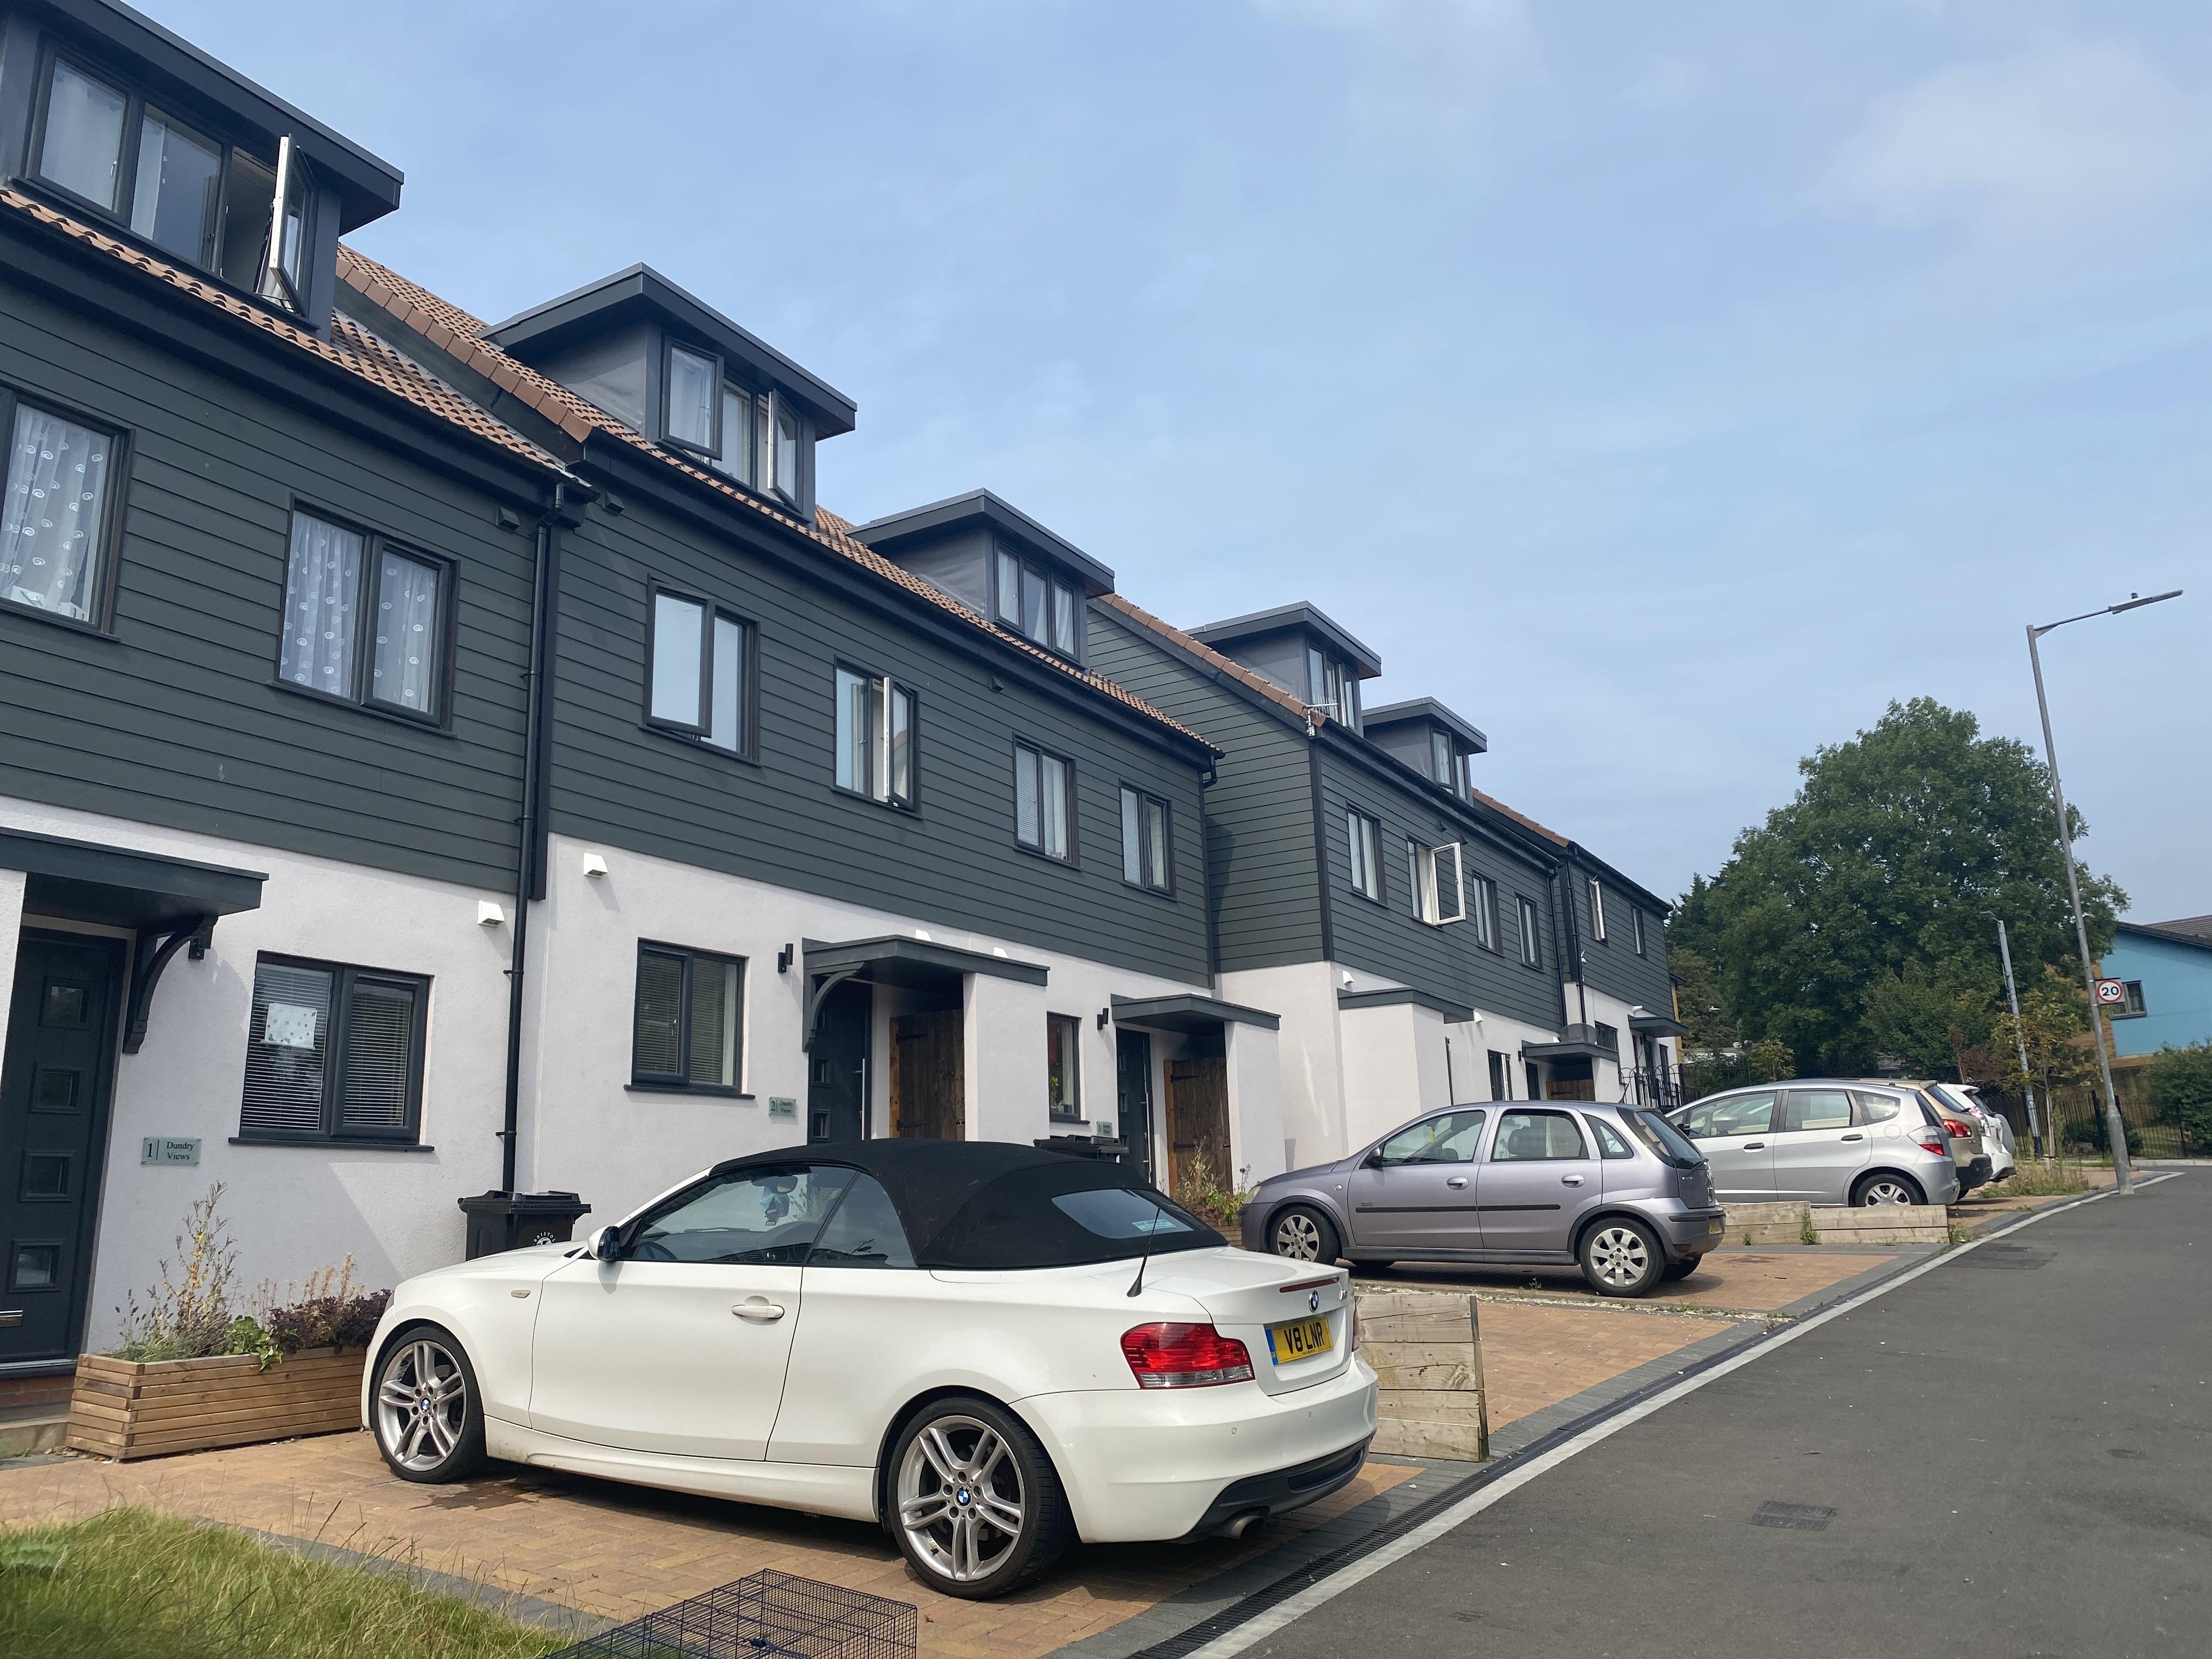 Affordable-Sips-Homes-Bristol-5